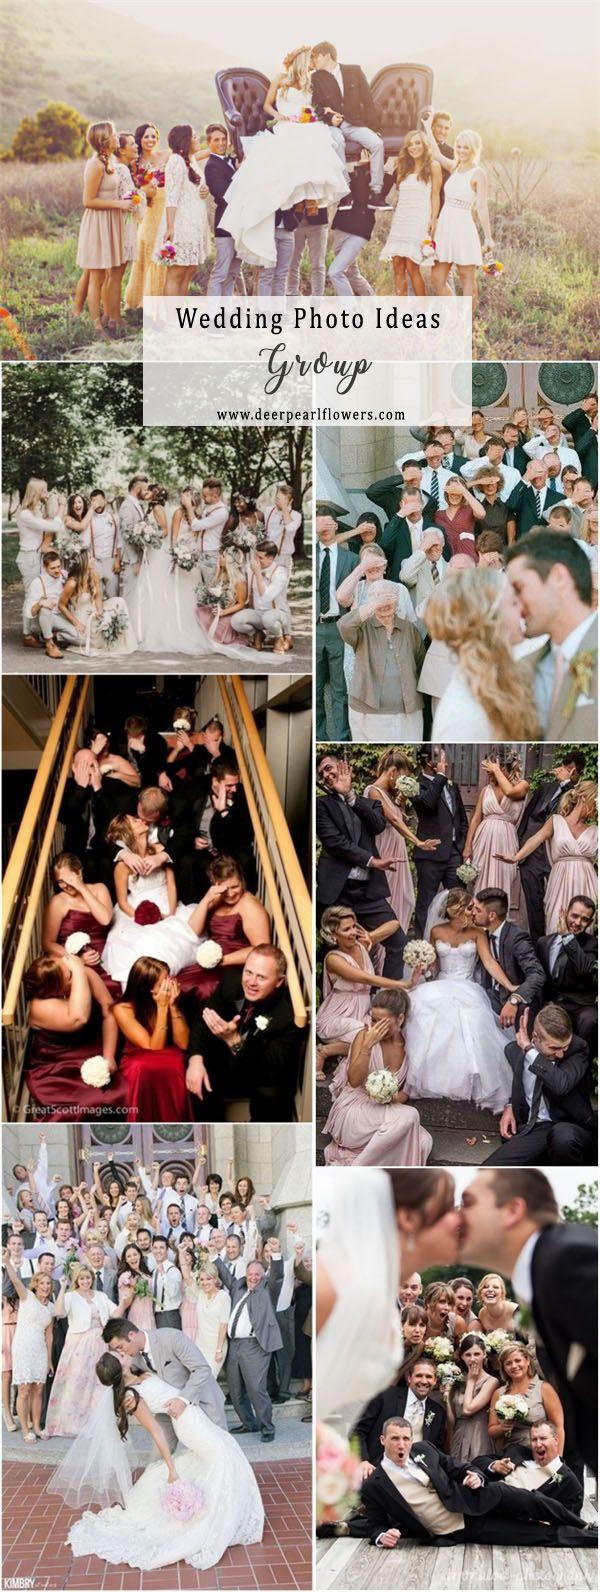 Wedding group photo ideas and poses  #weddingideas #weddingphotos #wedding / http://www.deerpearlflowers.com/wedding-photo-ideas-and-poses/